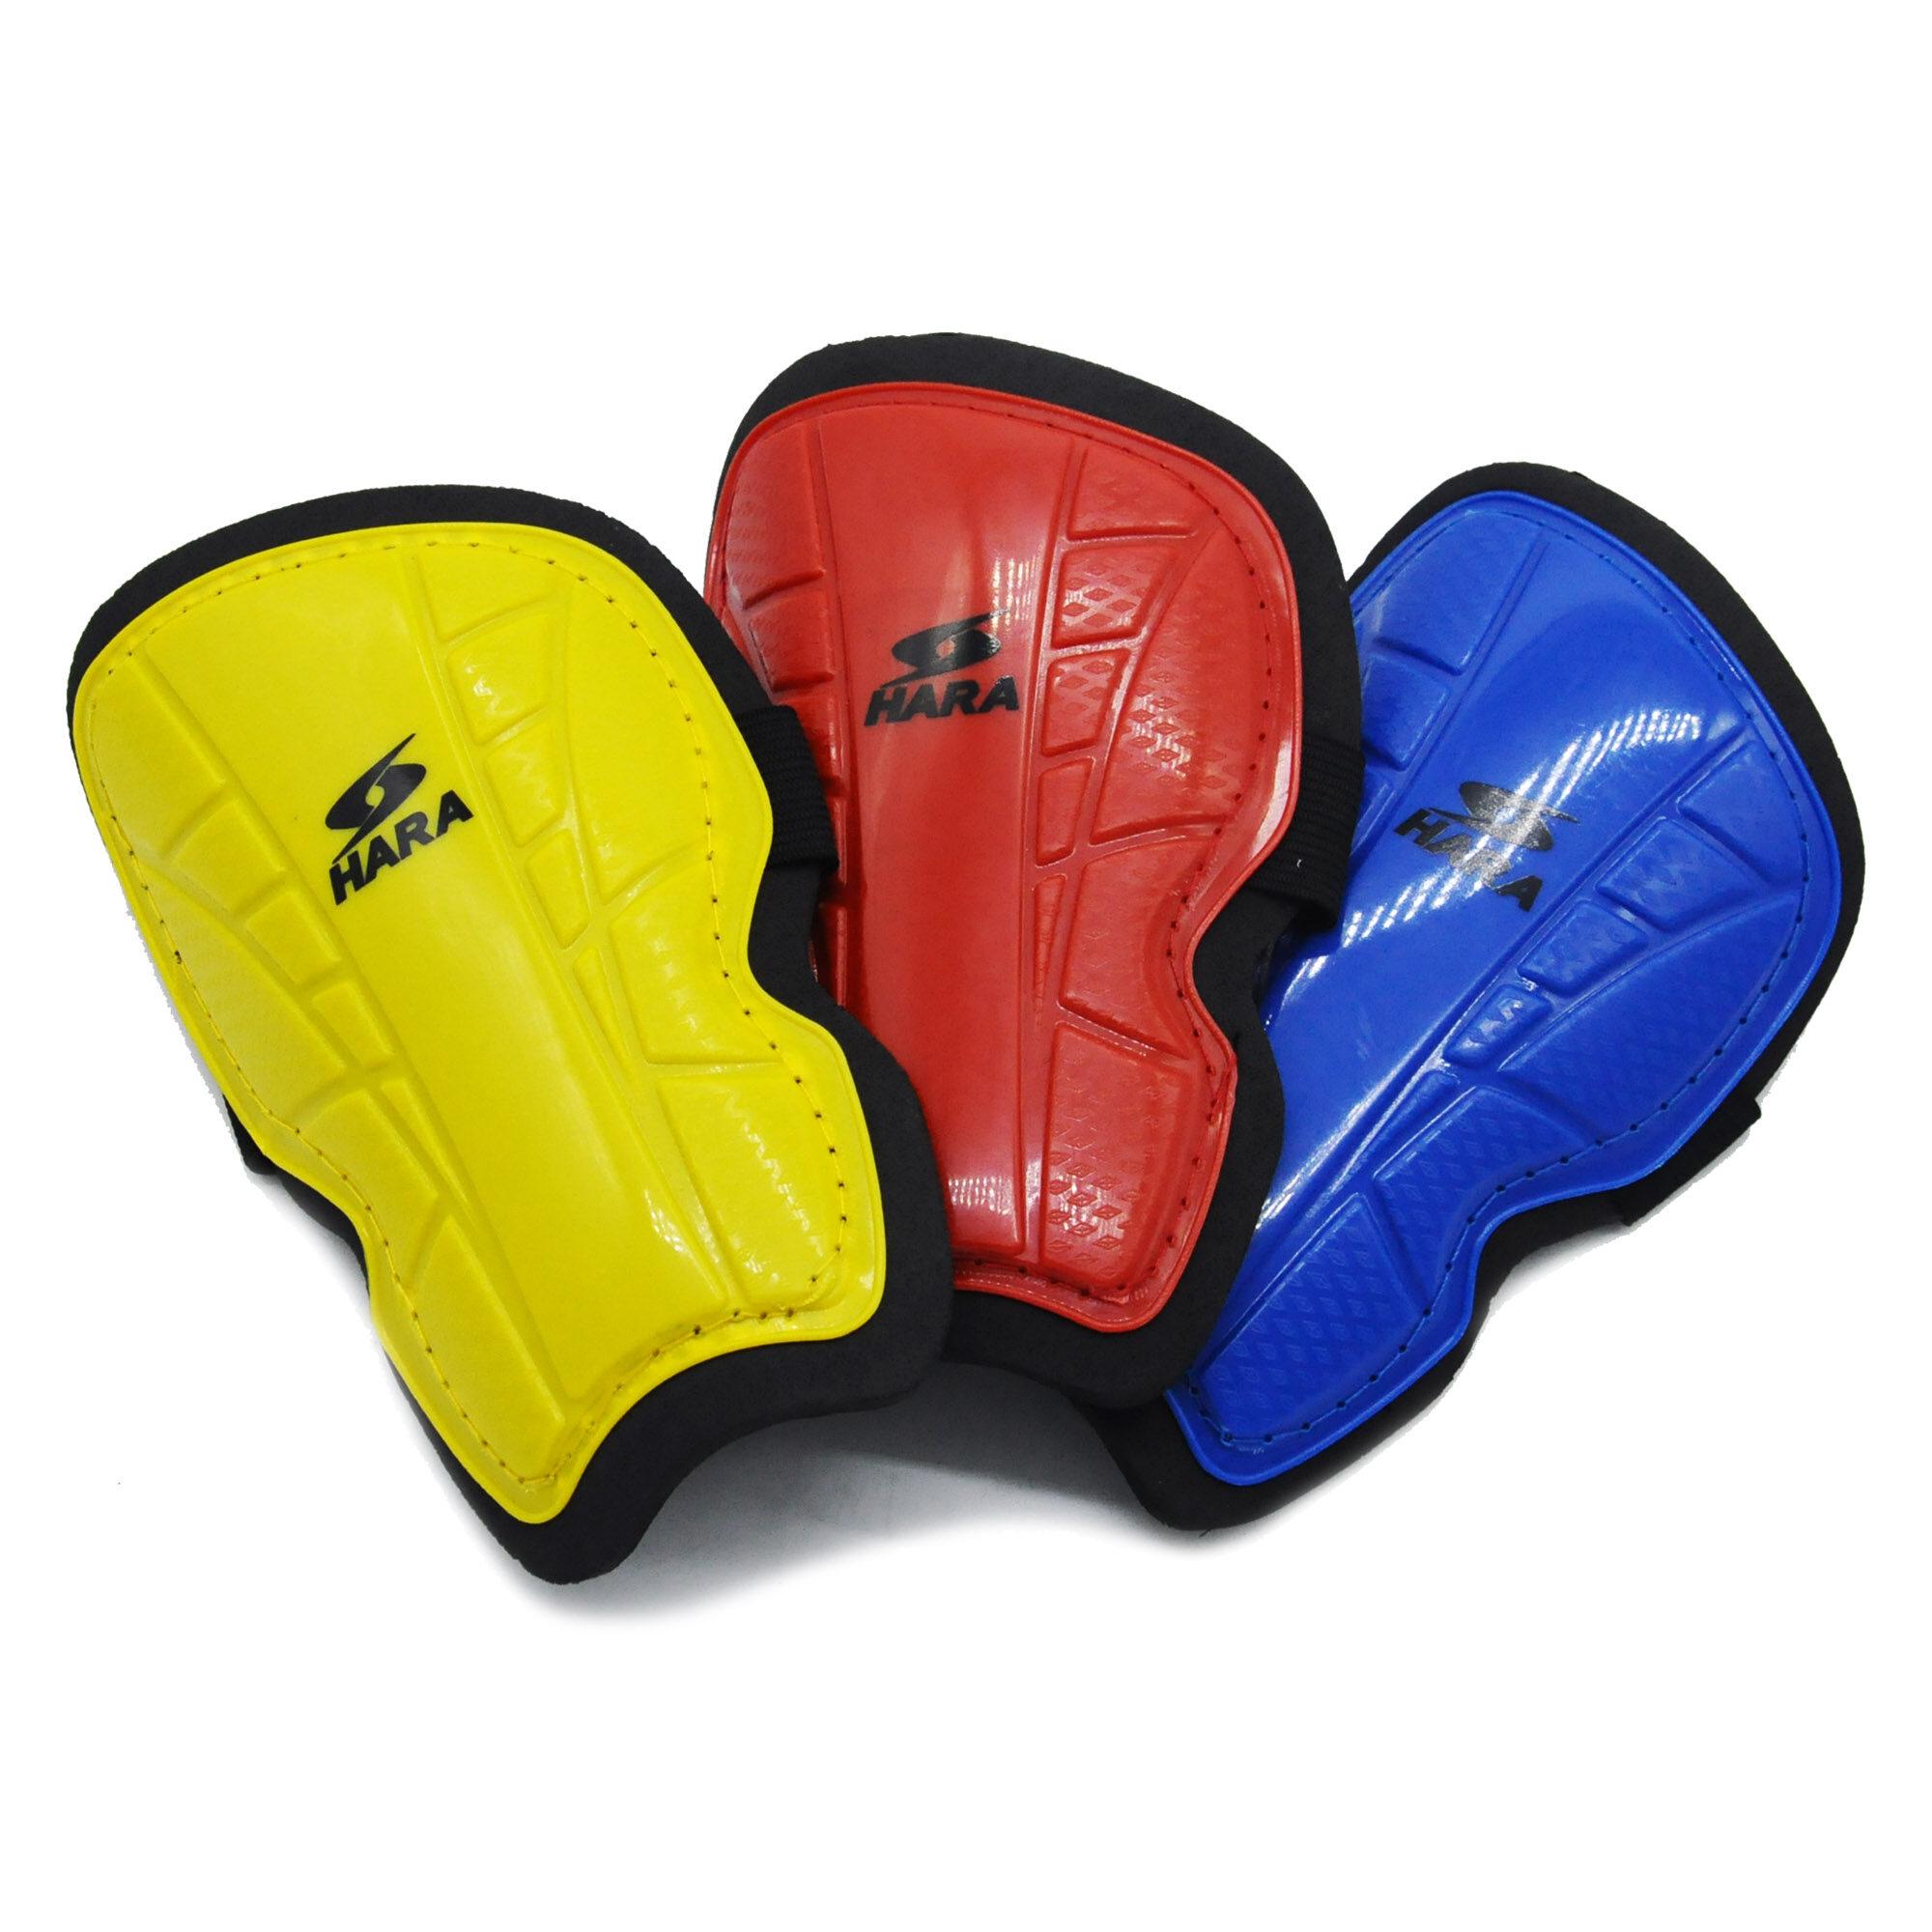 Hara Sports สนับแข้งฟุตบอล แบบมีสายรัด ของเด็กและผู้ใหญ่.